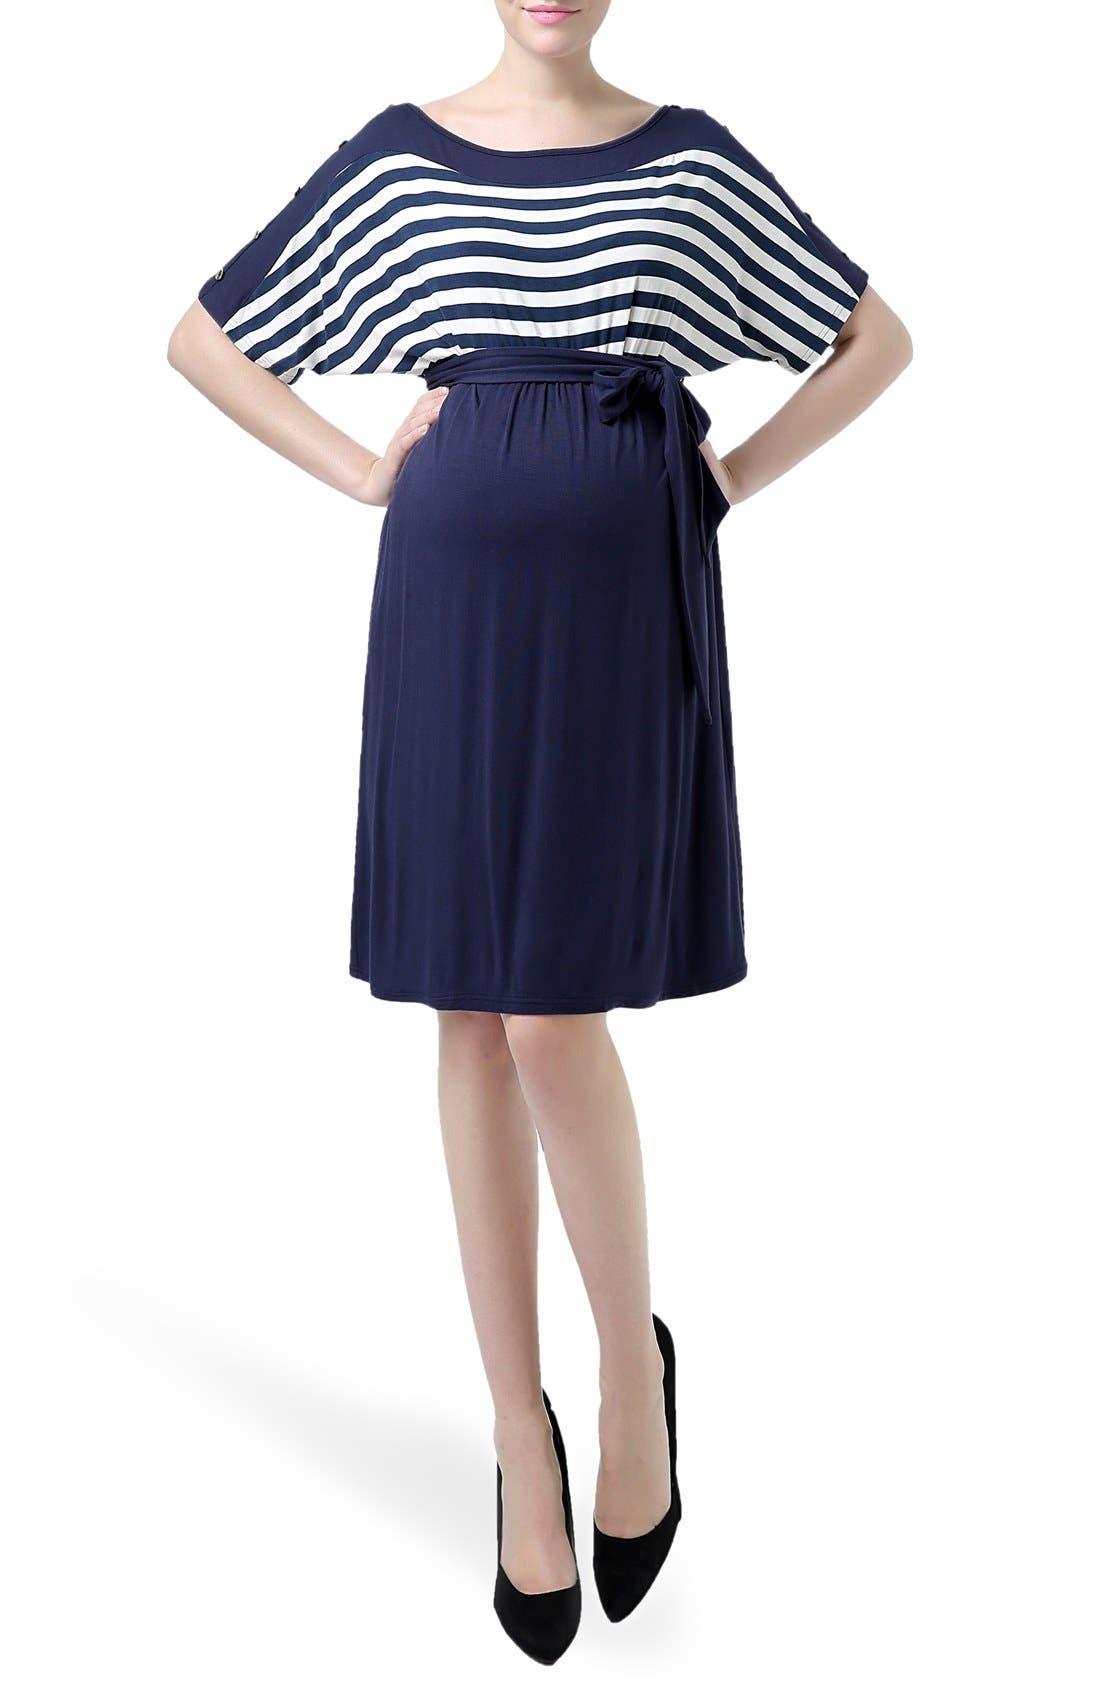 Alternate Image 1 Selected - Kimi and Kai 'Willow' Stripe Maternity Dress